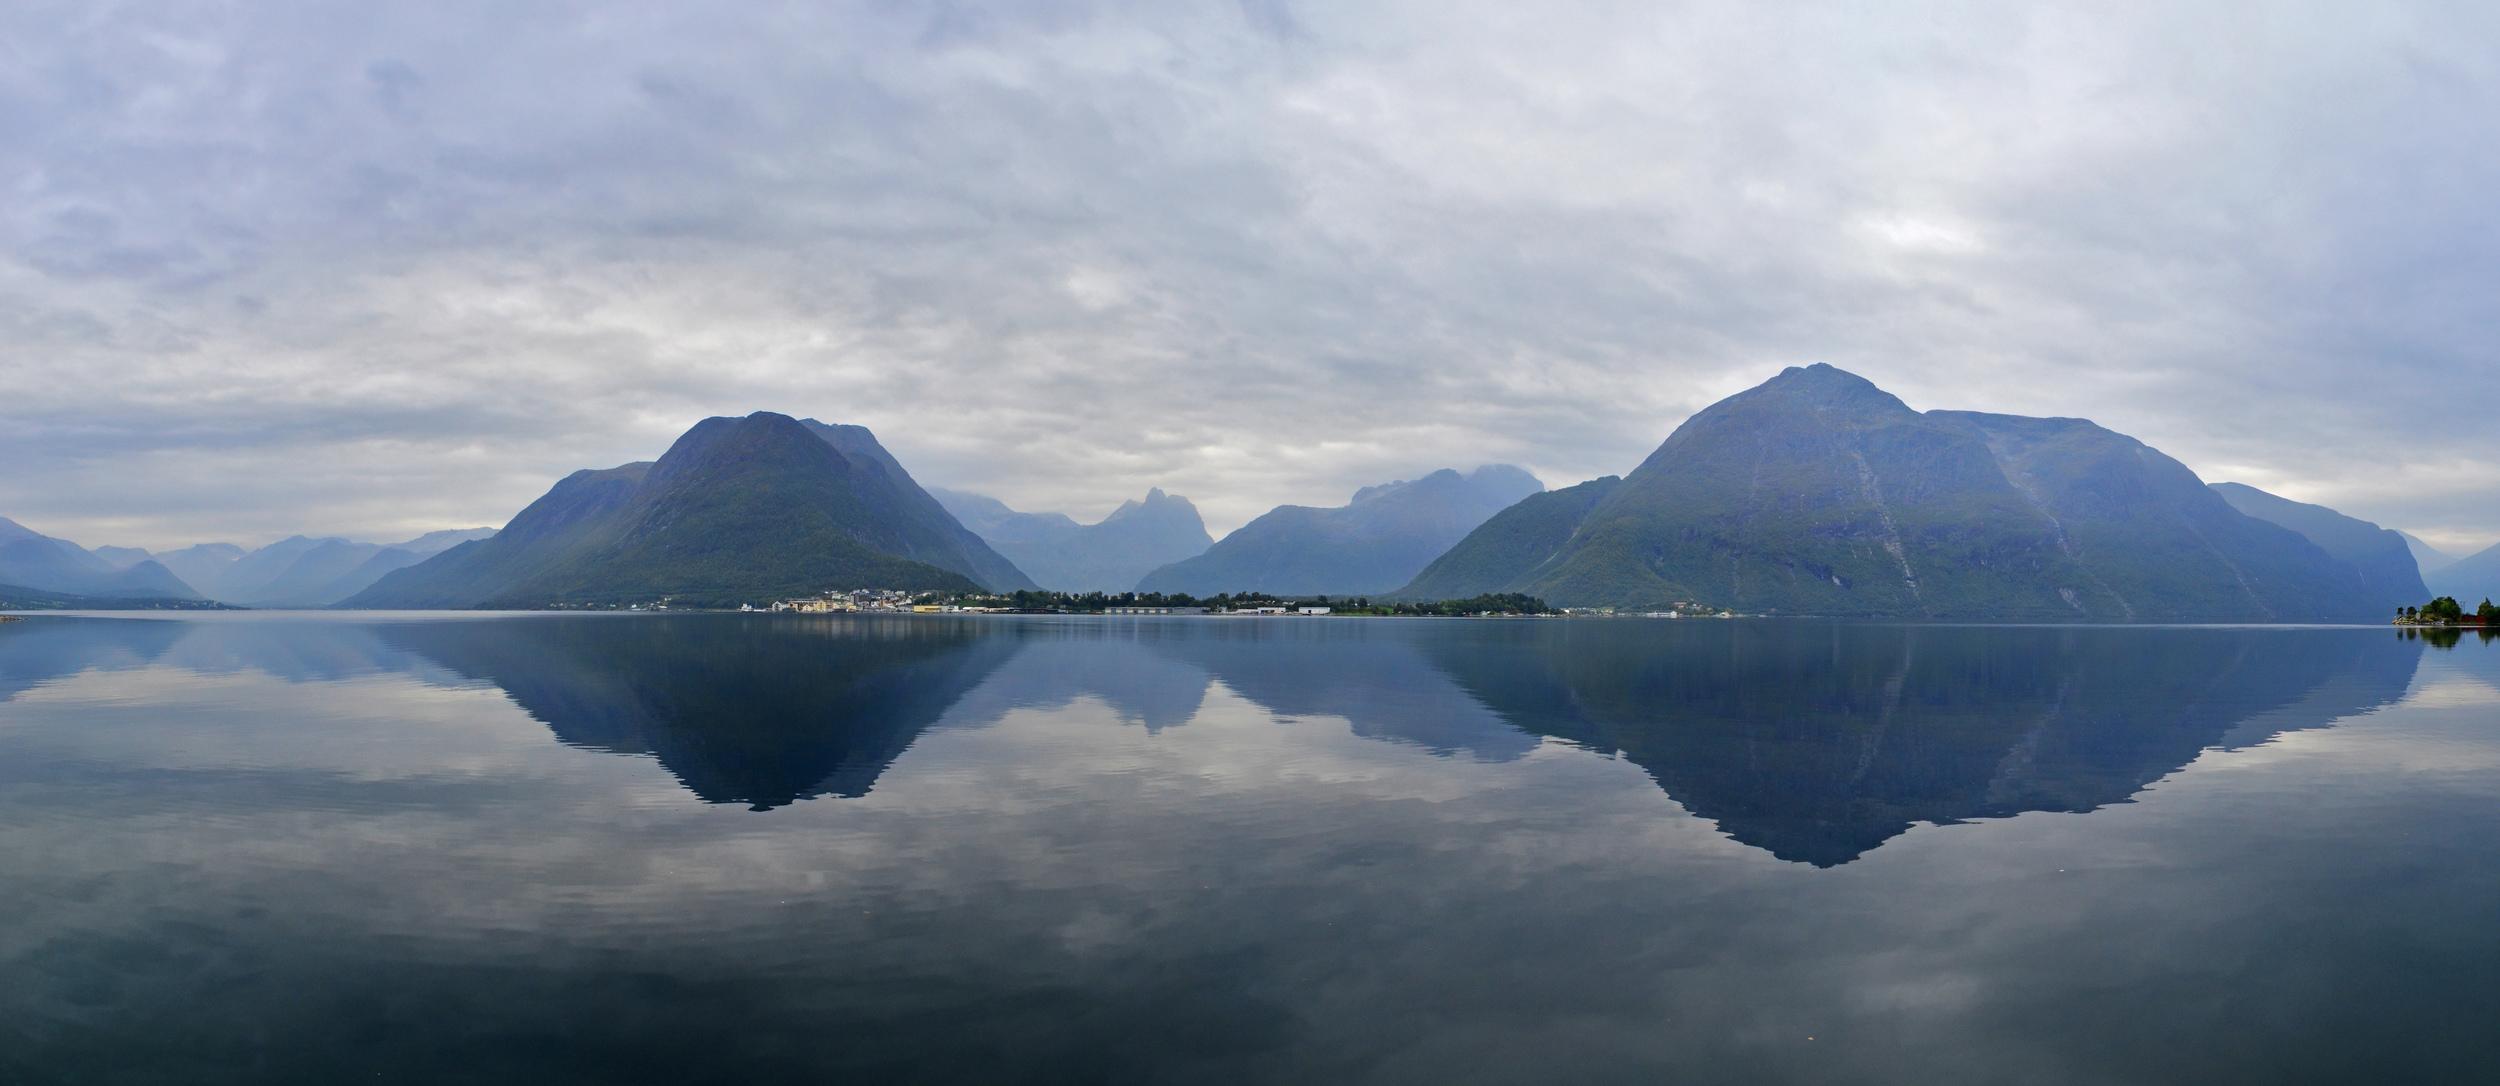 Reflections of Romsdalsfjorden, Norway.